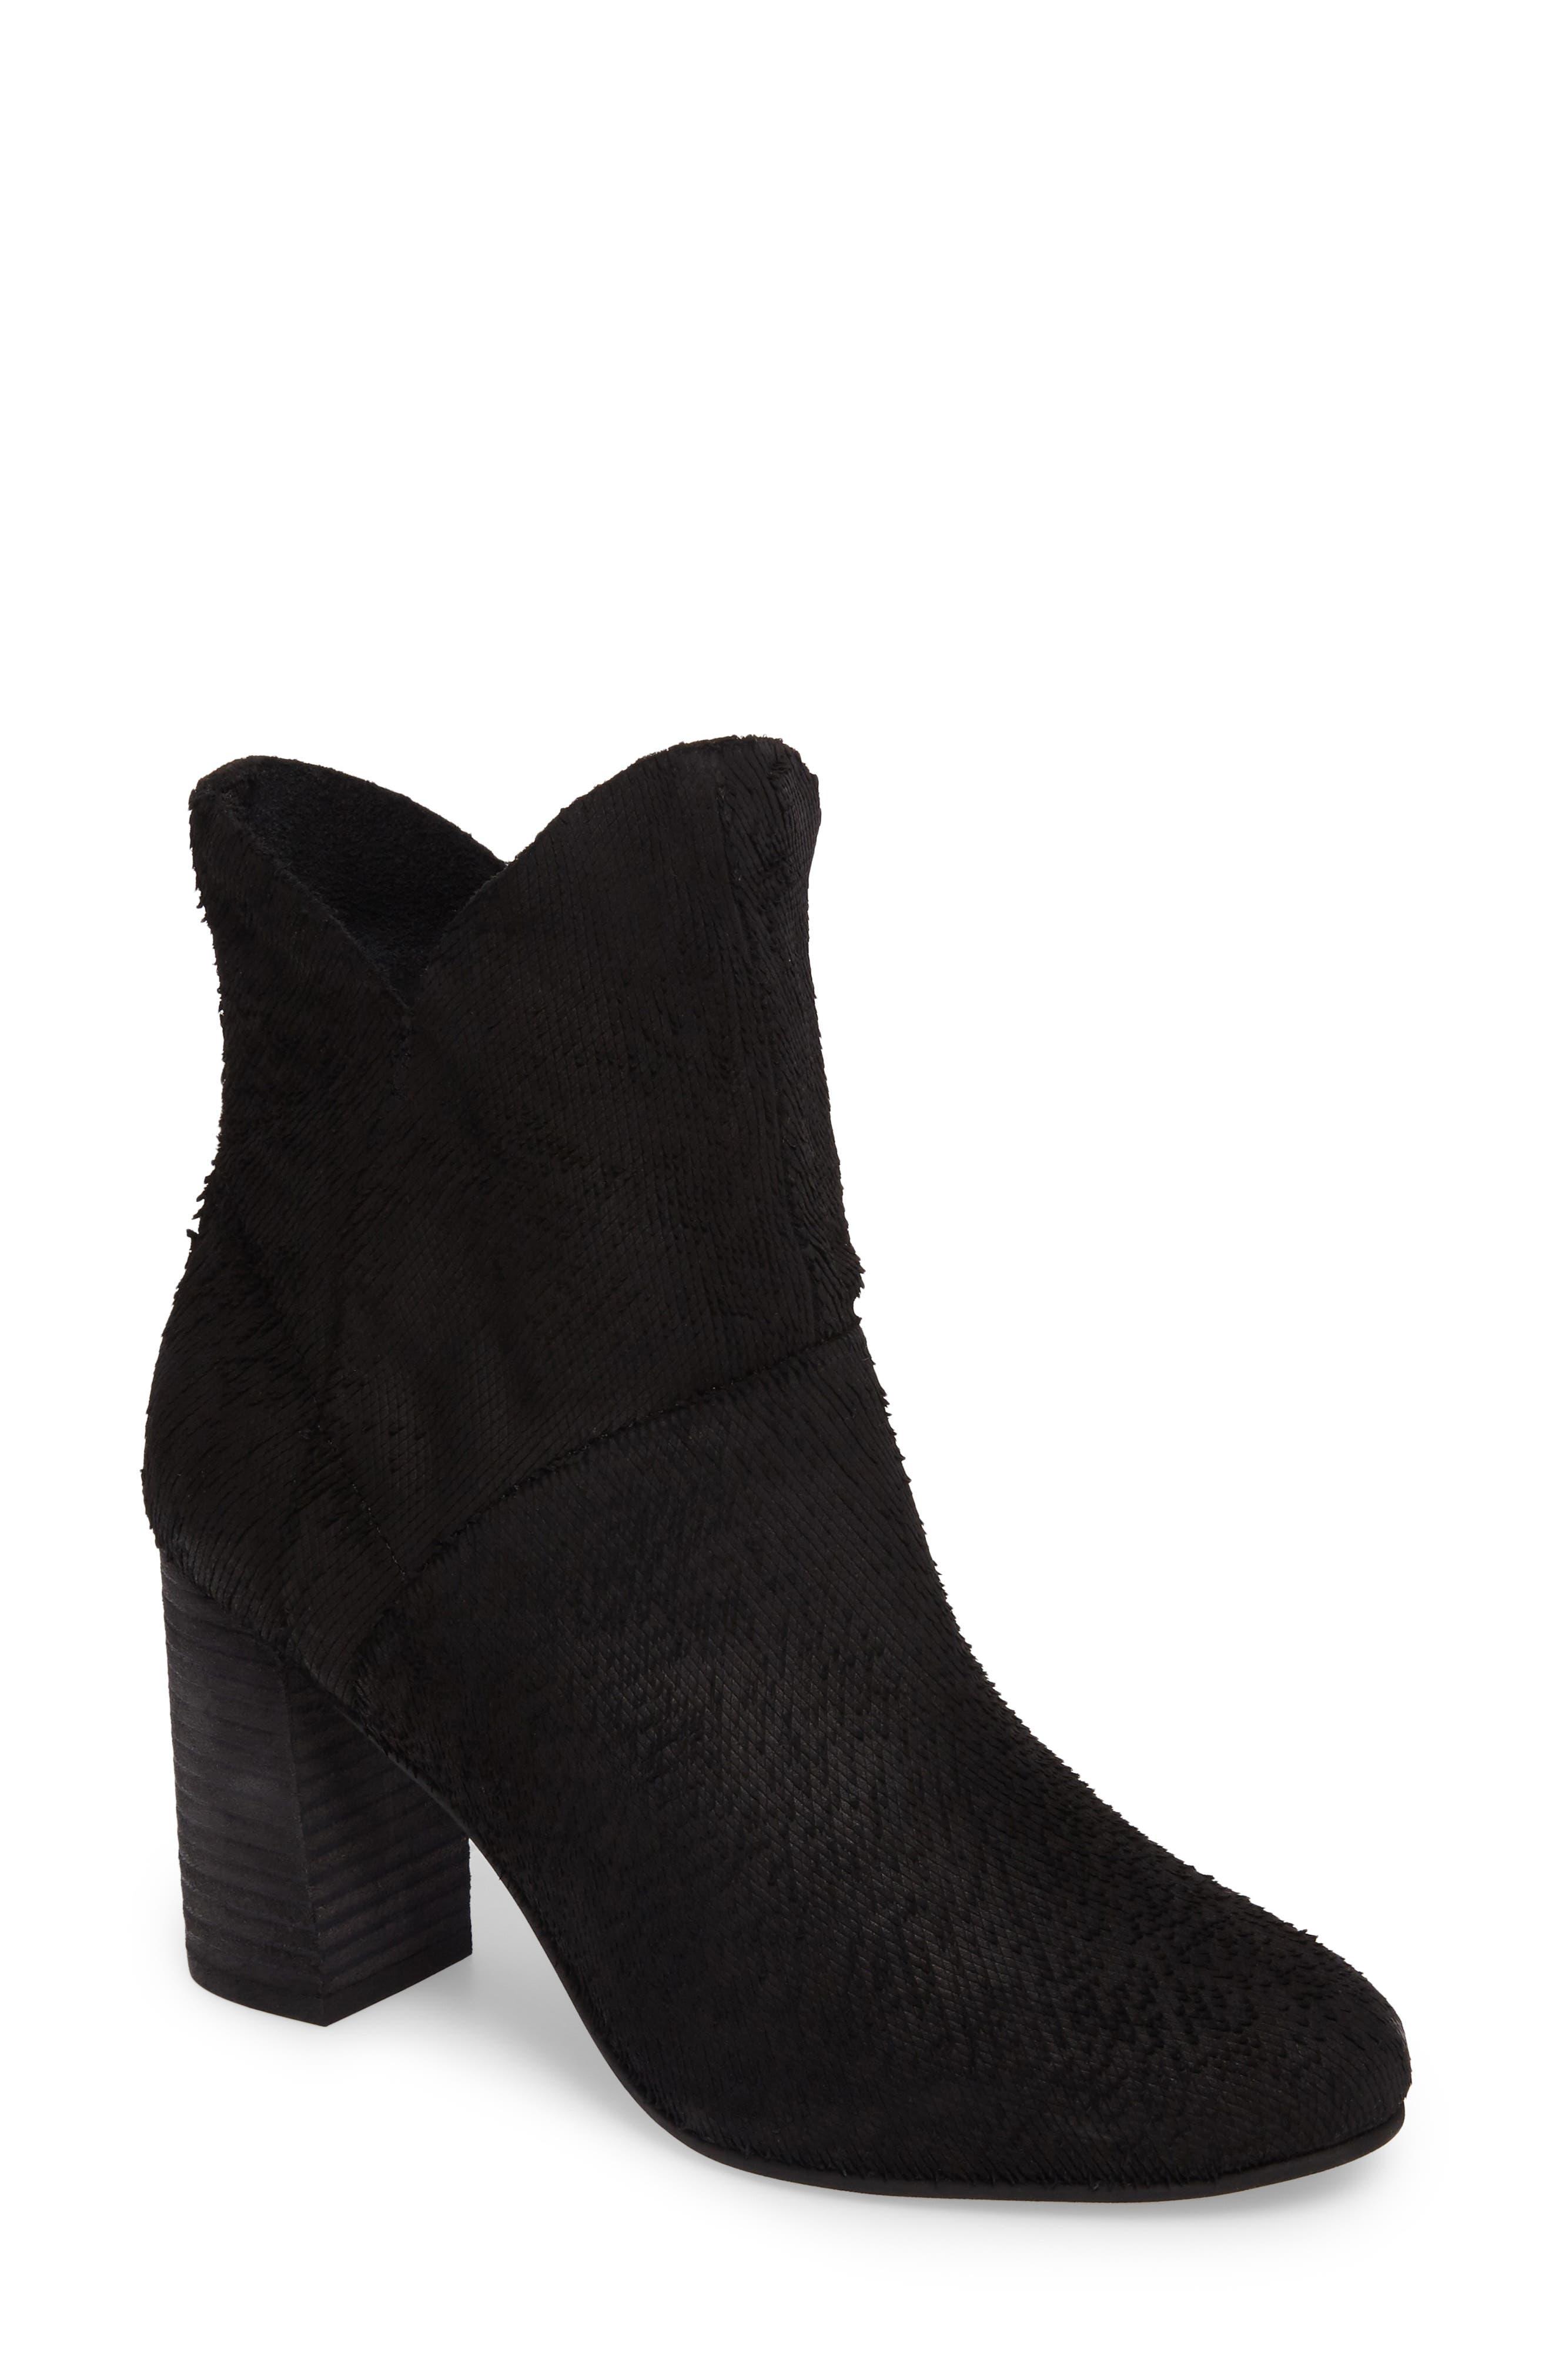 Prop Boot,                         Main,                         color, Black Suede